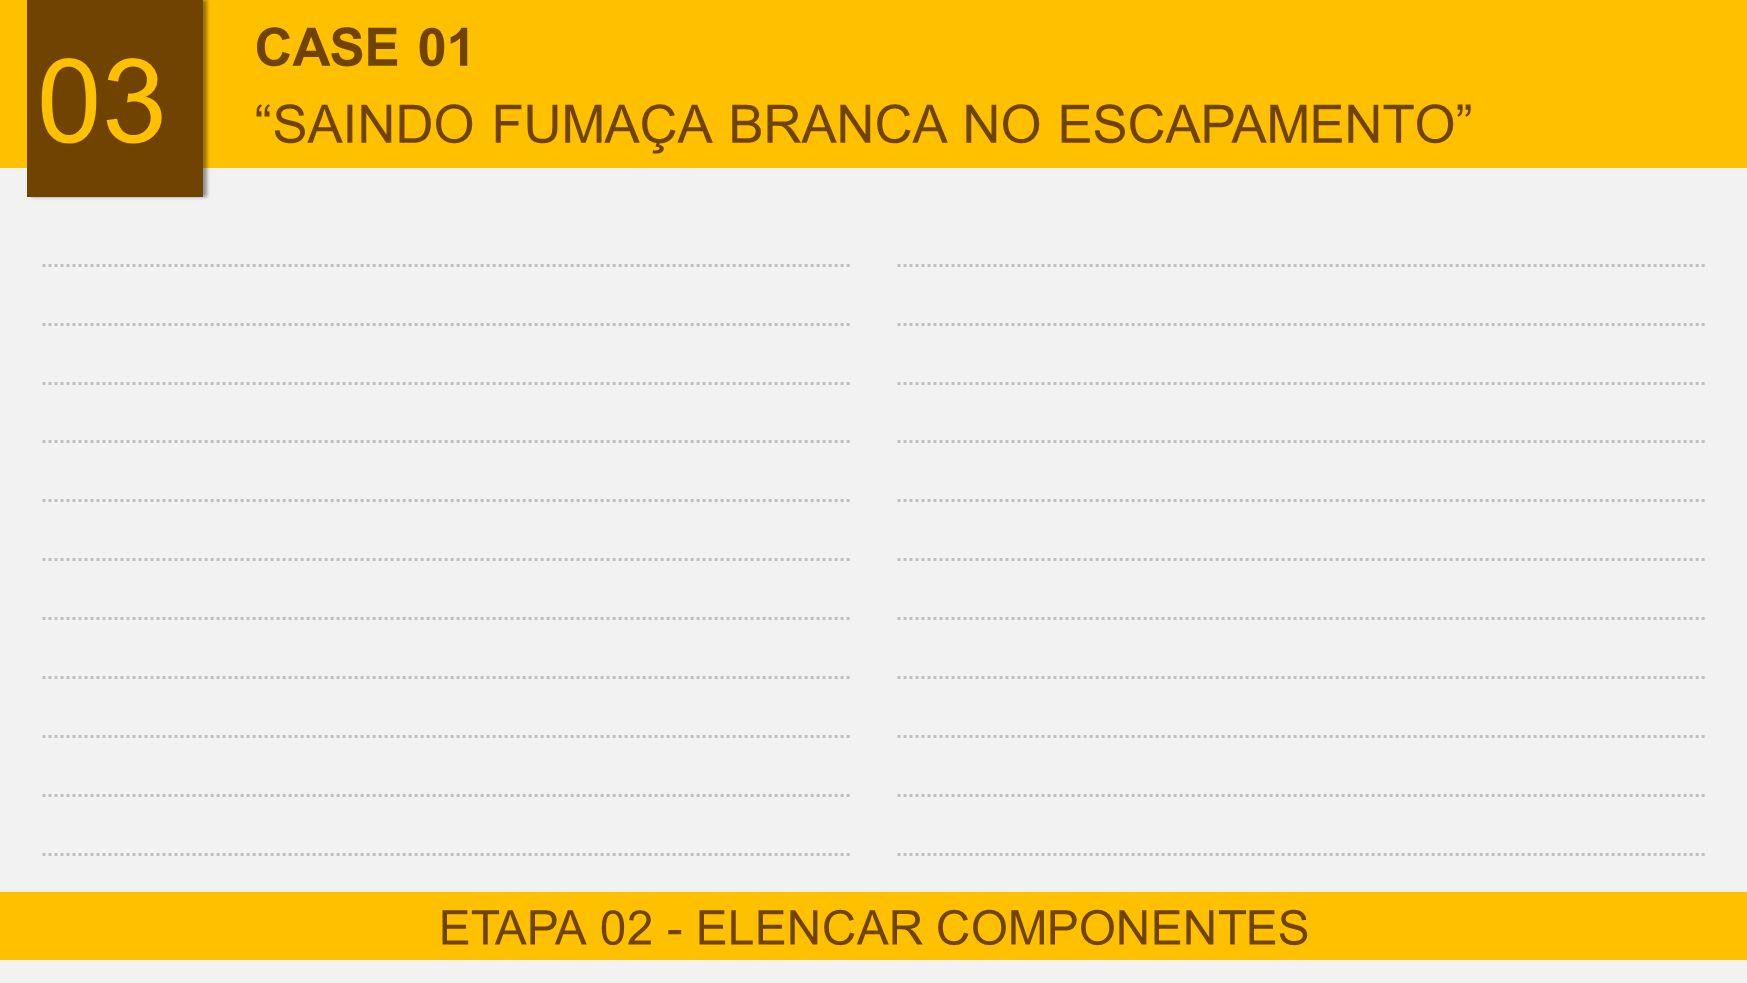 "03 ETAPA 02 - ELENCAR COMPONENTES CASE 01 ""SAINDO FUMAÇA BRANCA NO ESCAPAMENTO"""